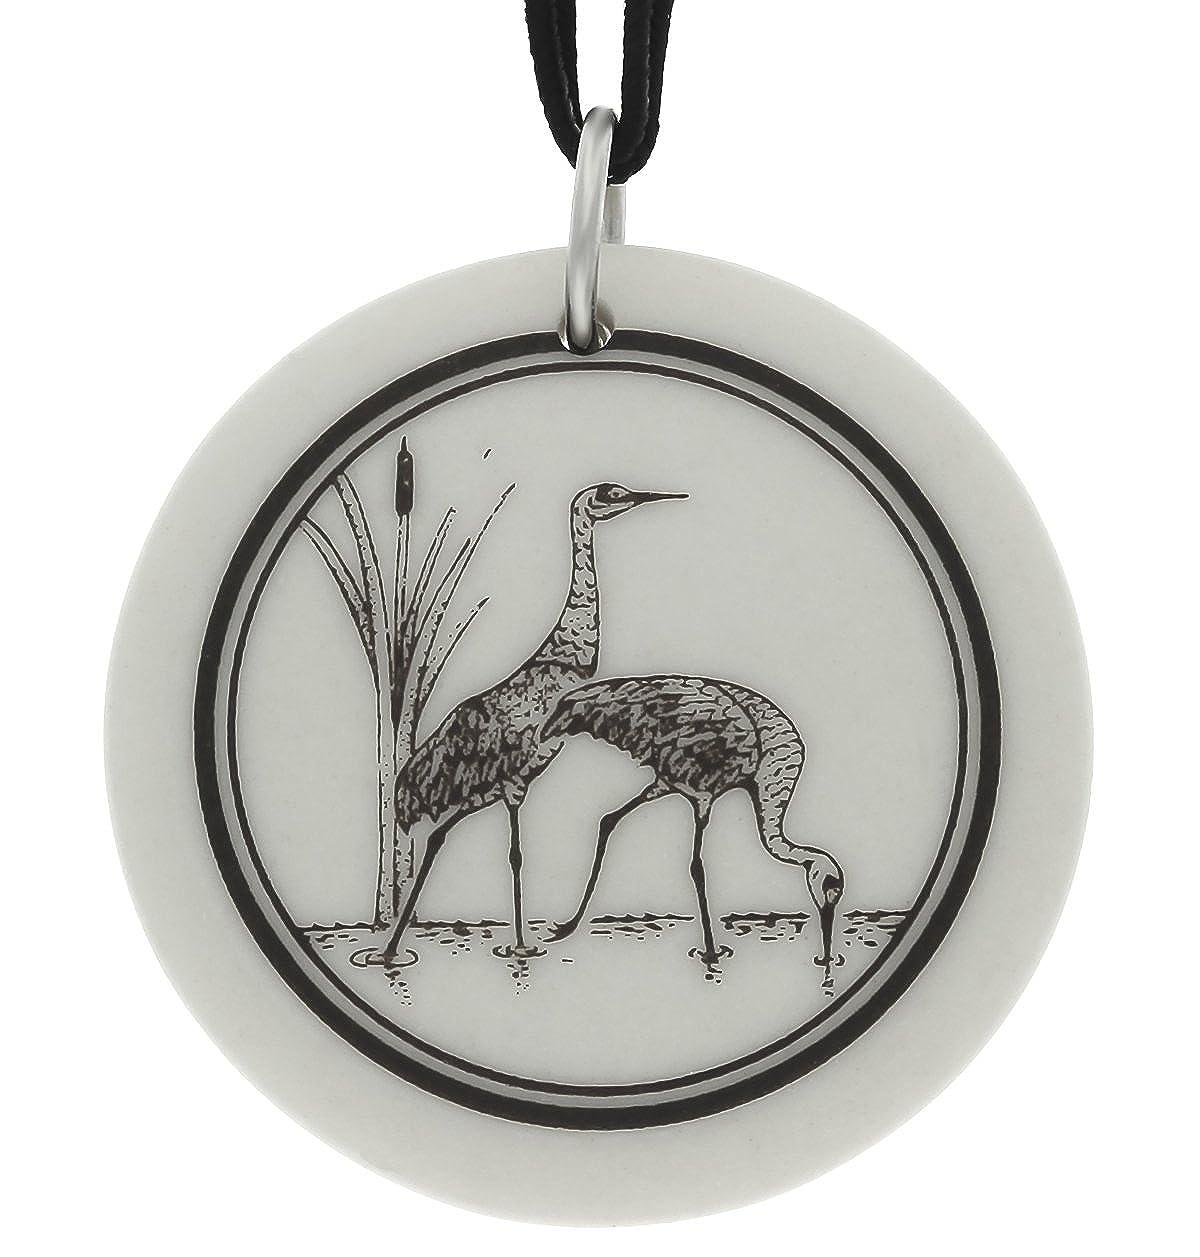 Handmade Sandhill Crane Totem Round Porcelain Pendant on Black Cord